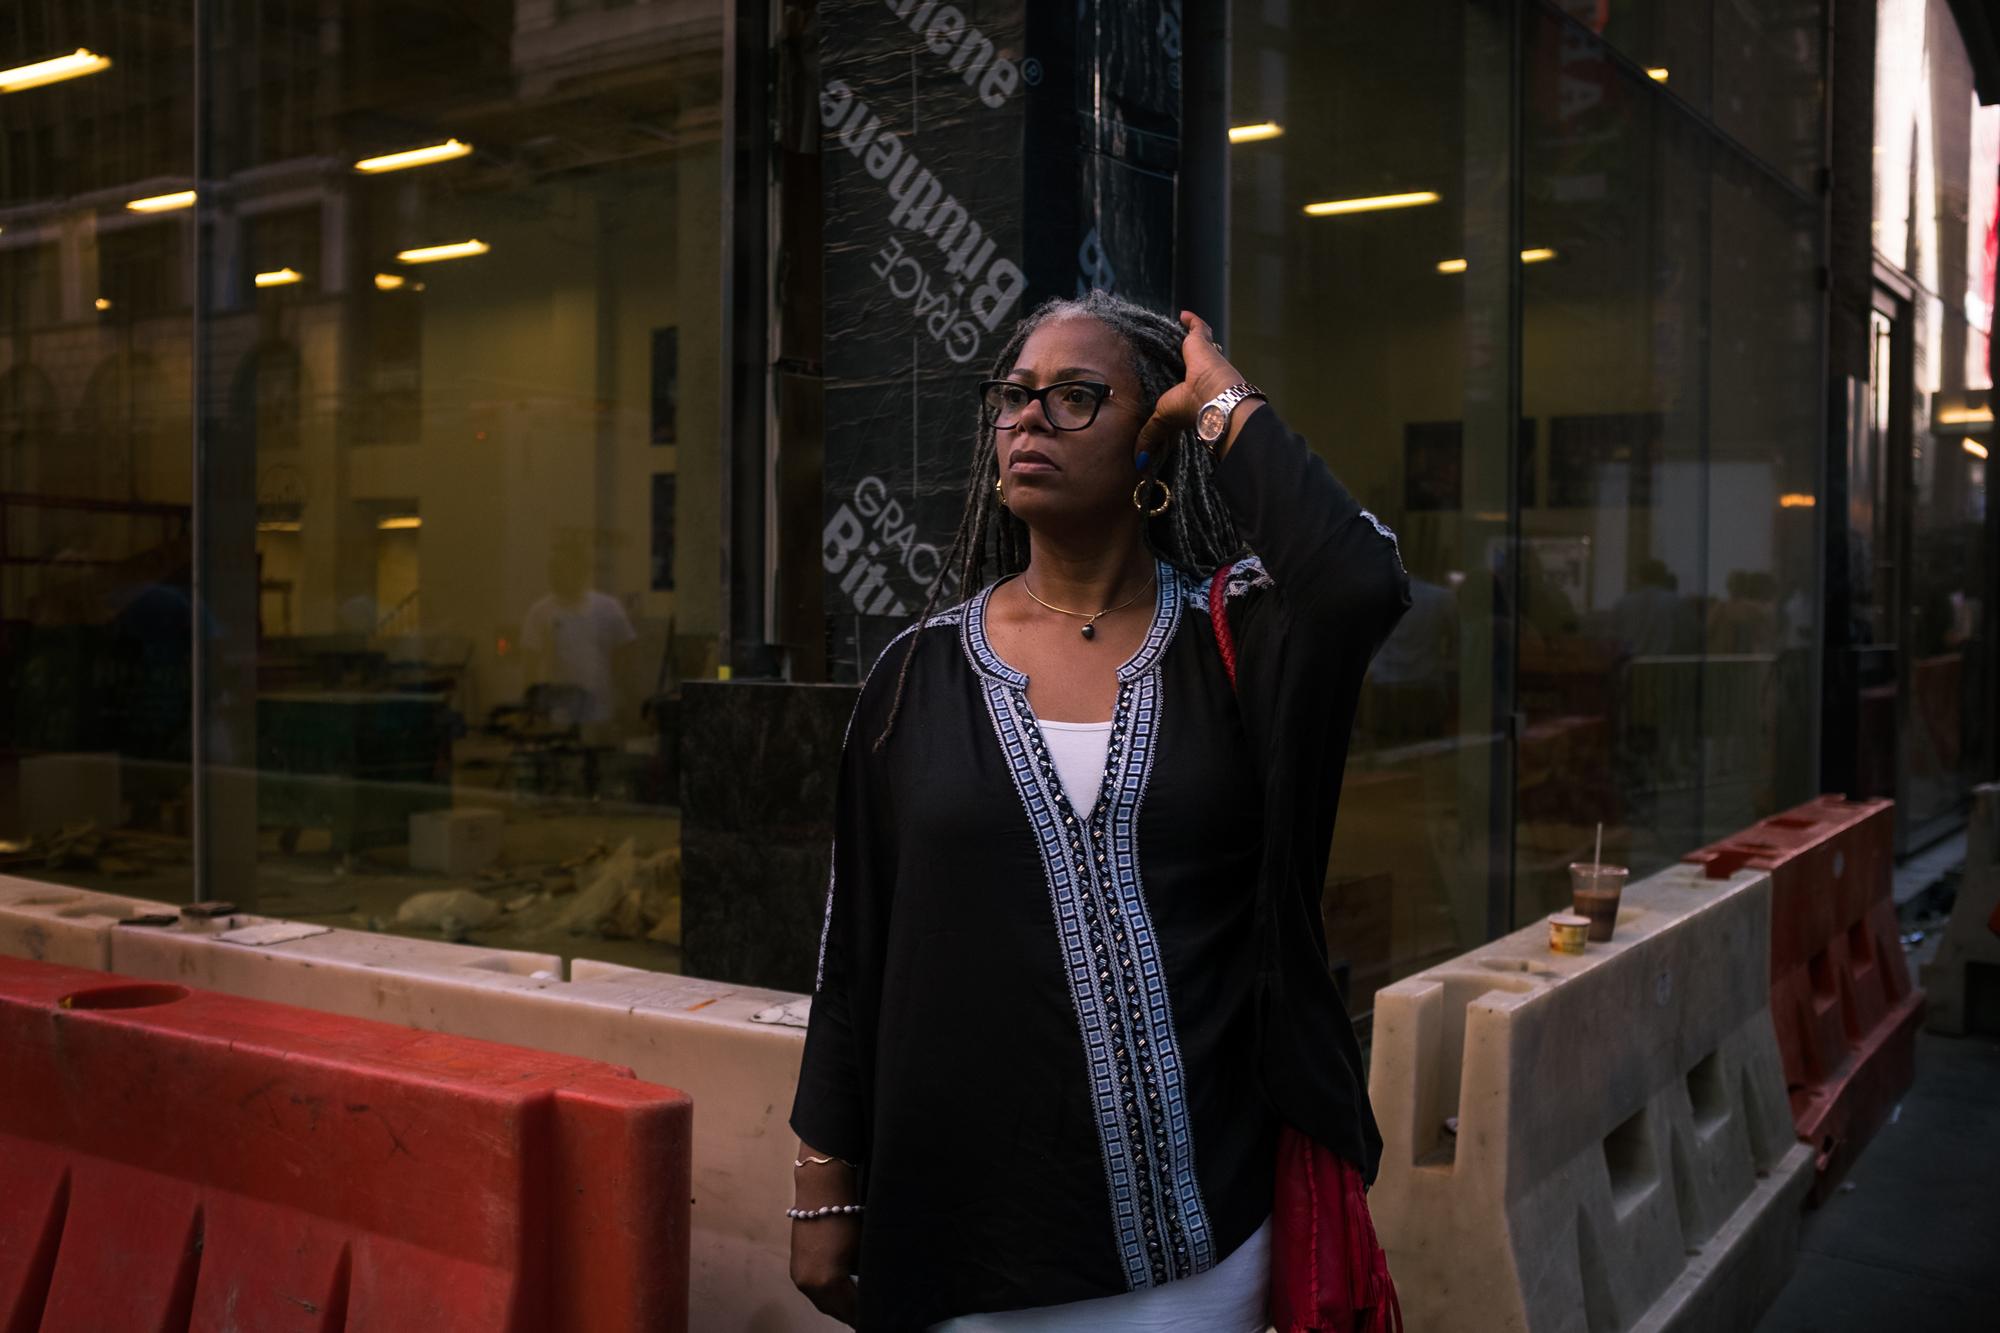 new-york-city-street-photographer-Zachary-Cabanas-7